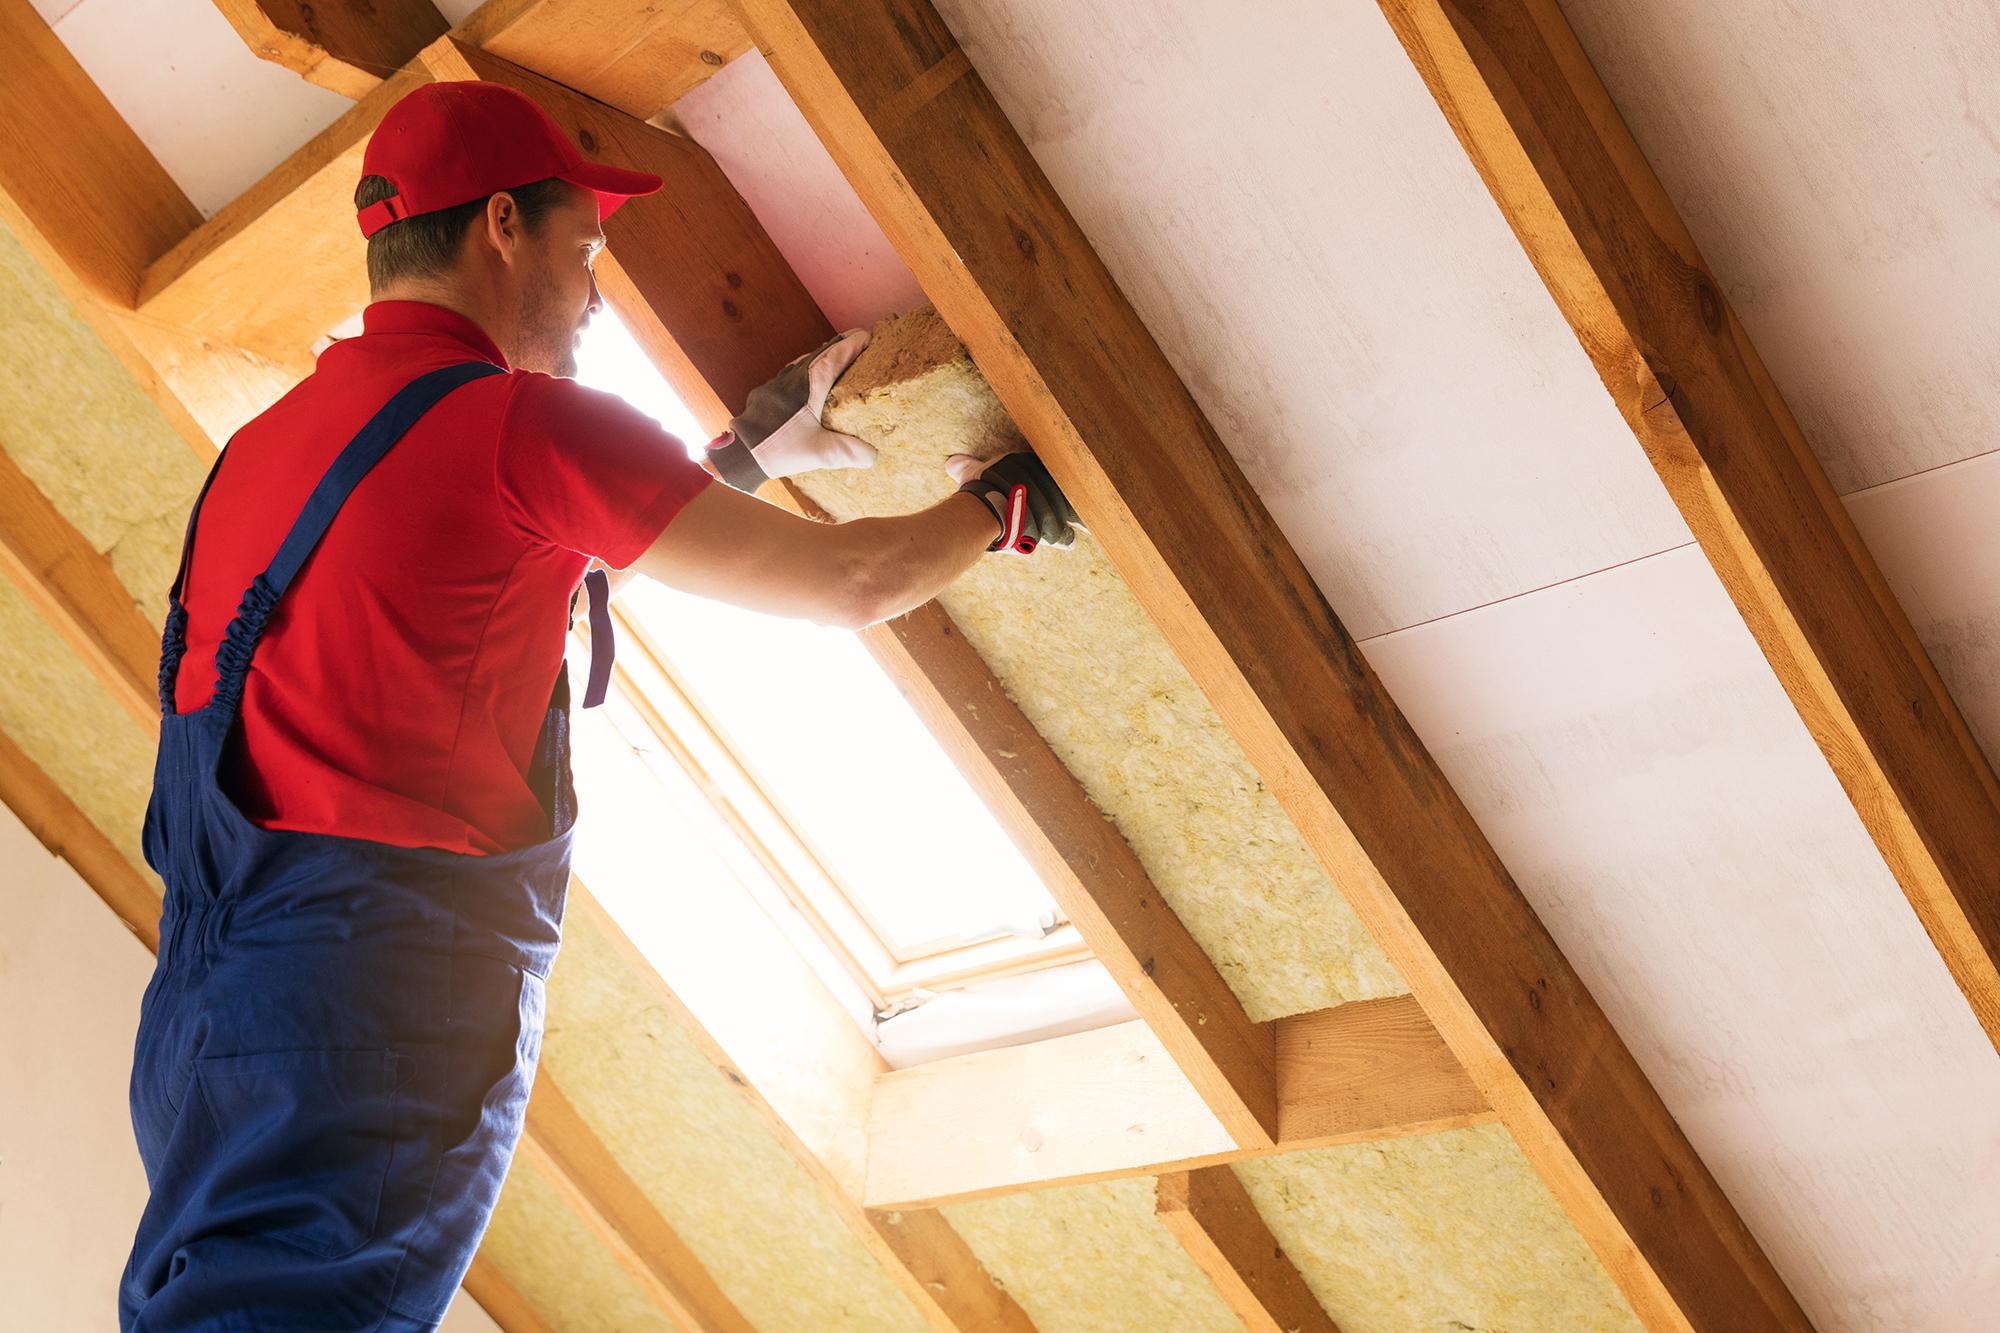 A worker installing insulation. (Image: Shutterstock)